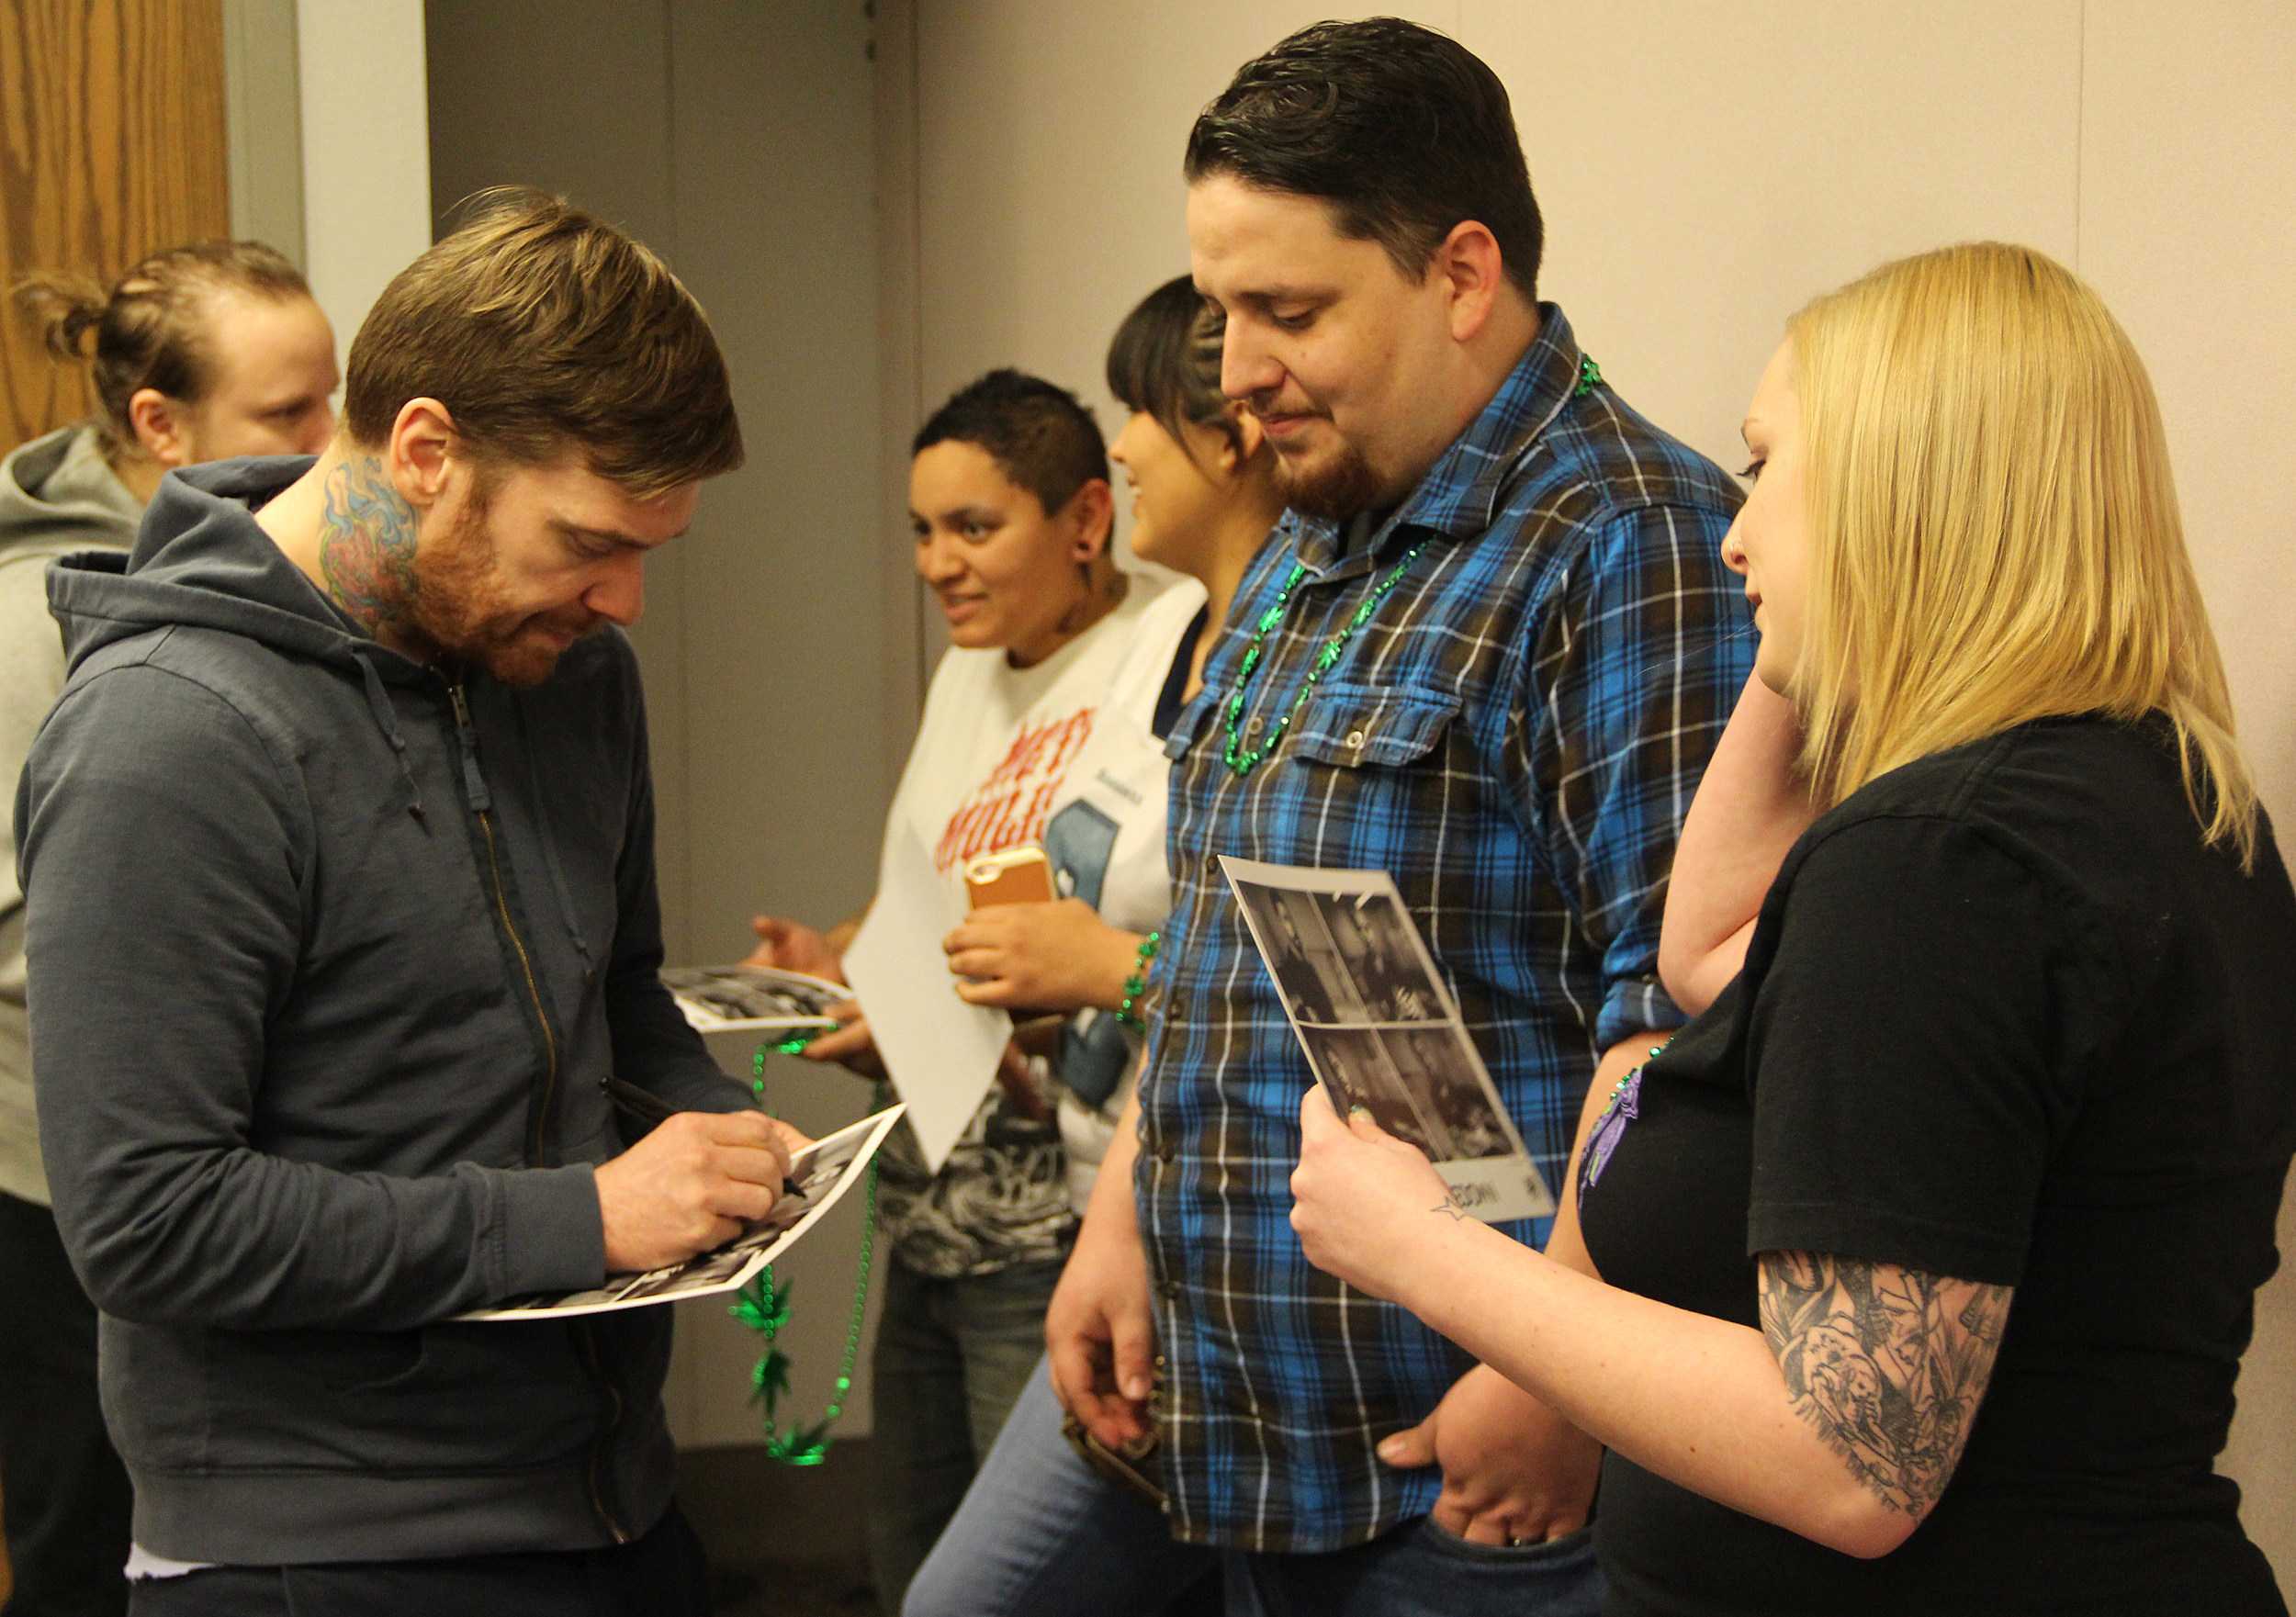 Casper Fans Meet N Greet Shinedown Photos